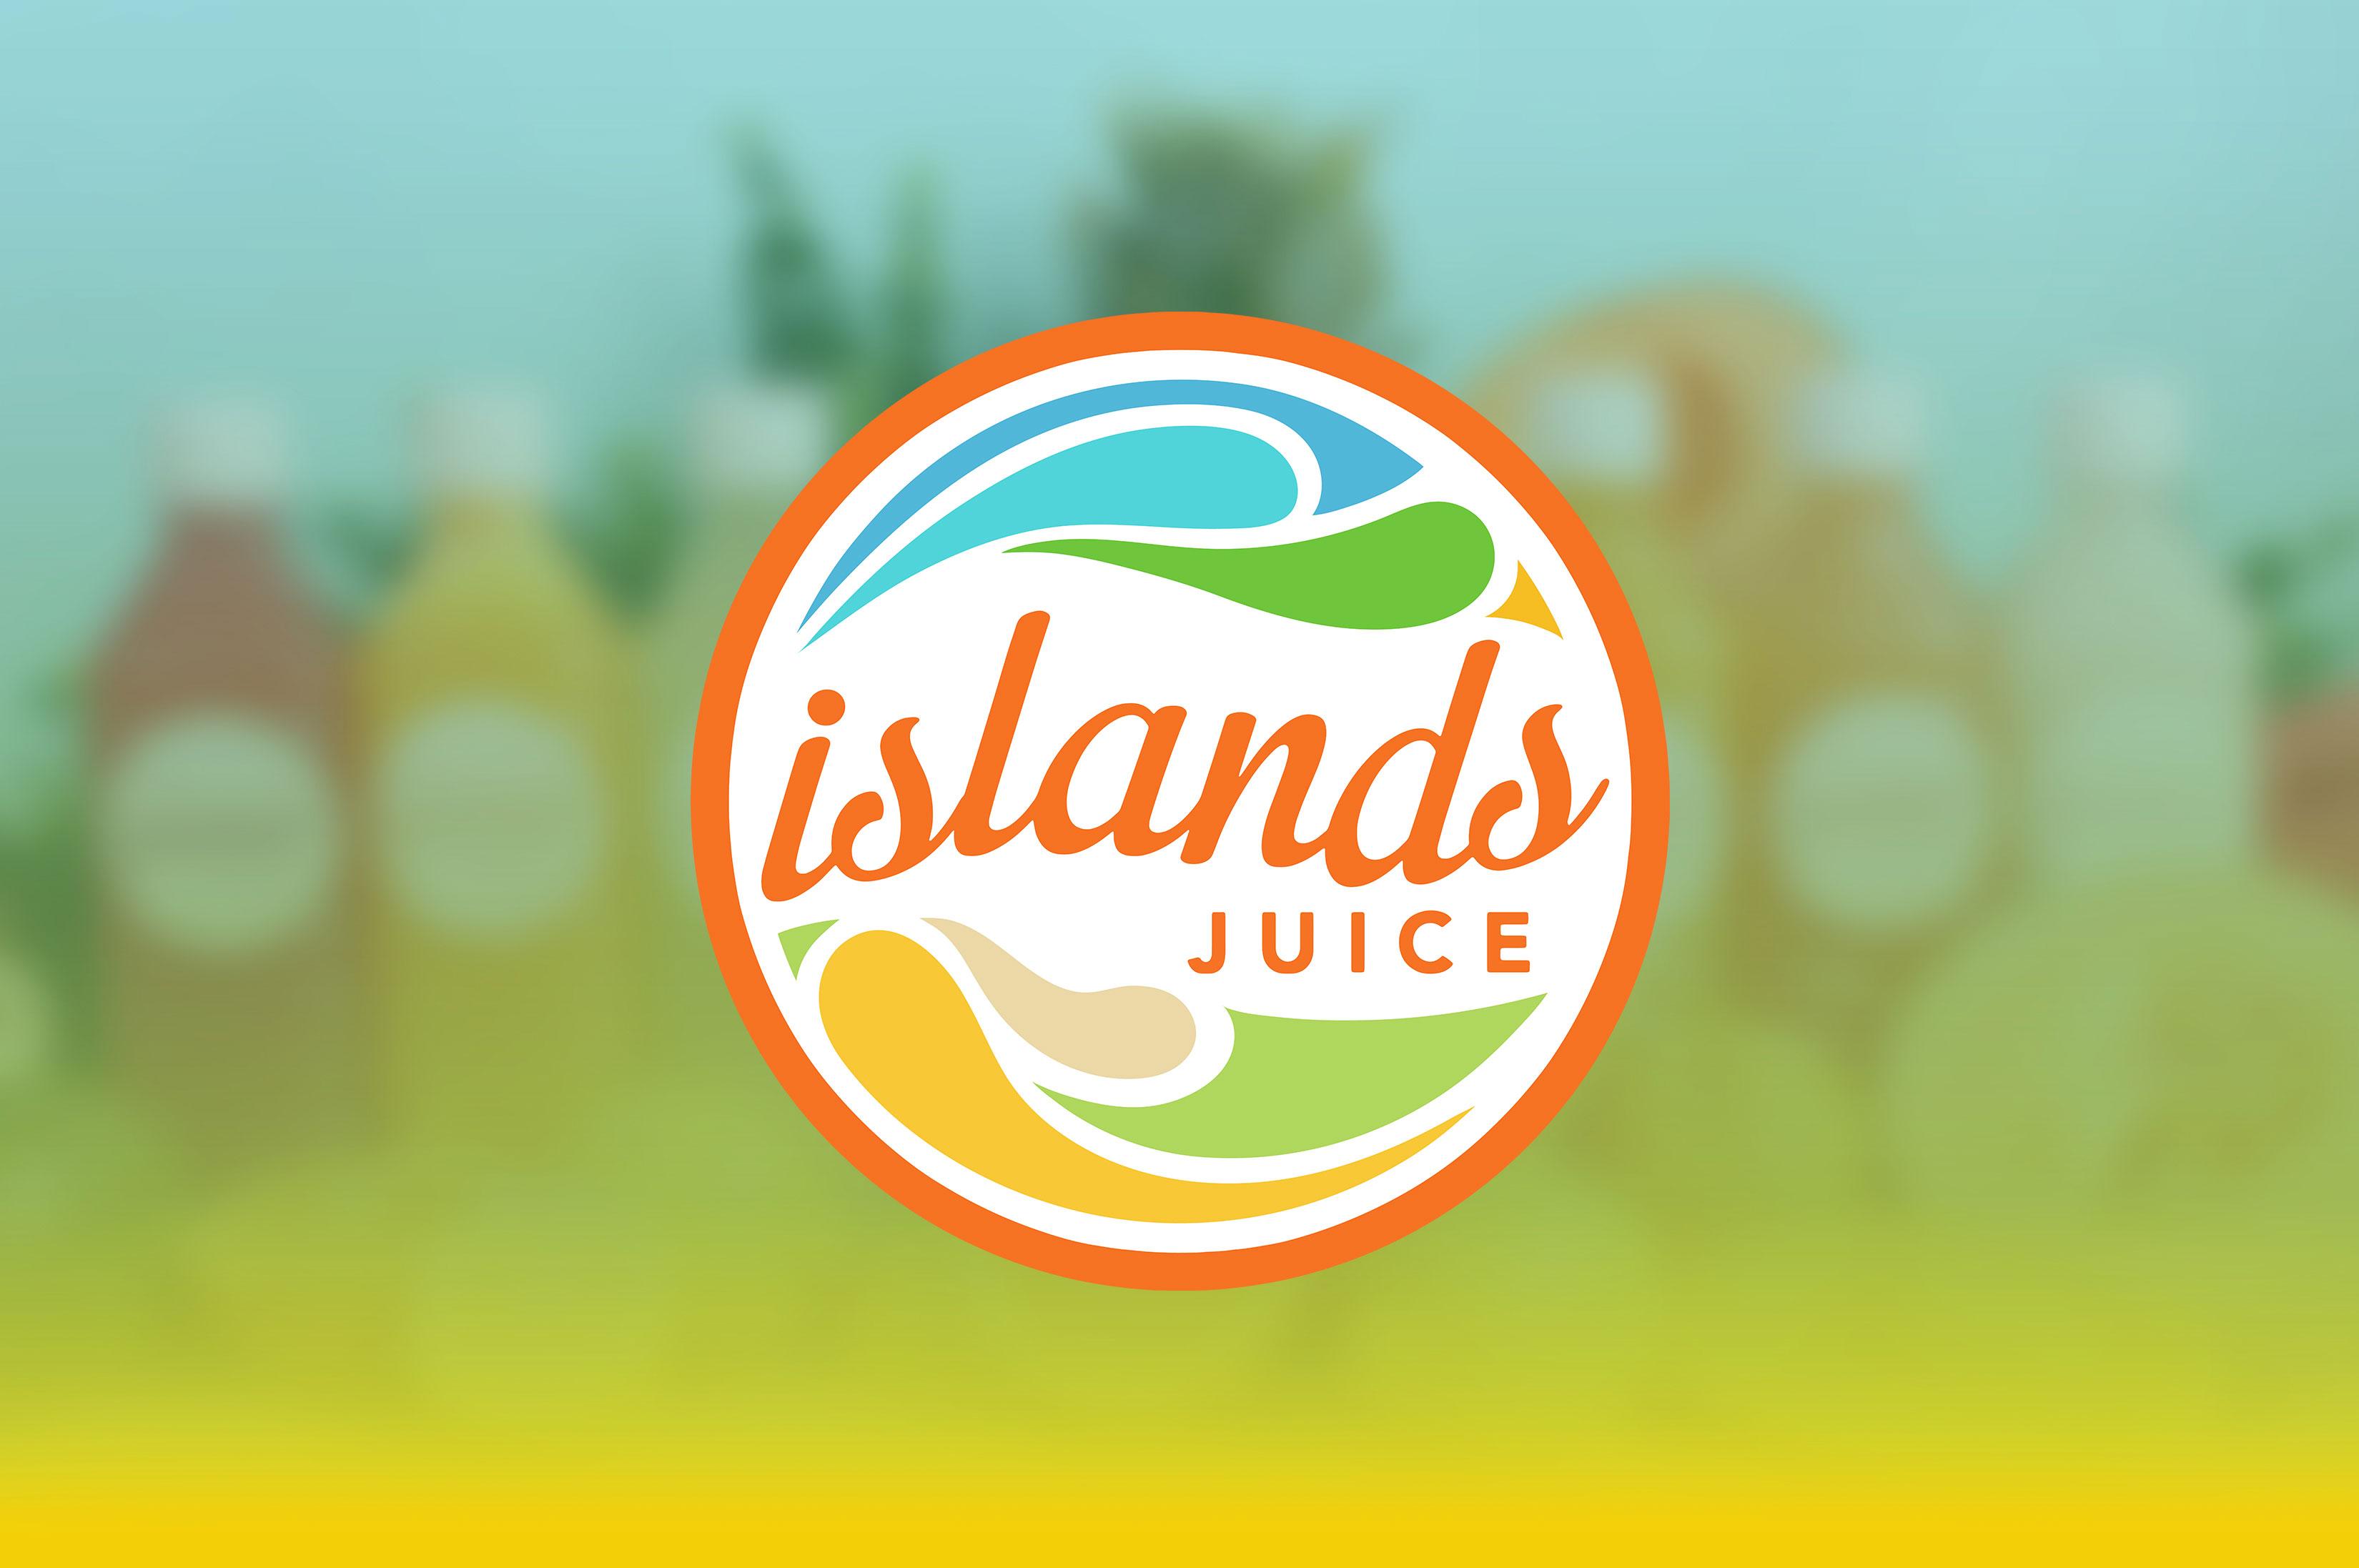 Replace-Islands-1